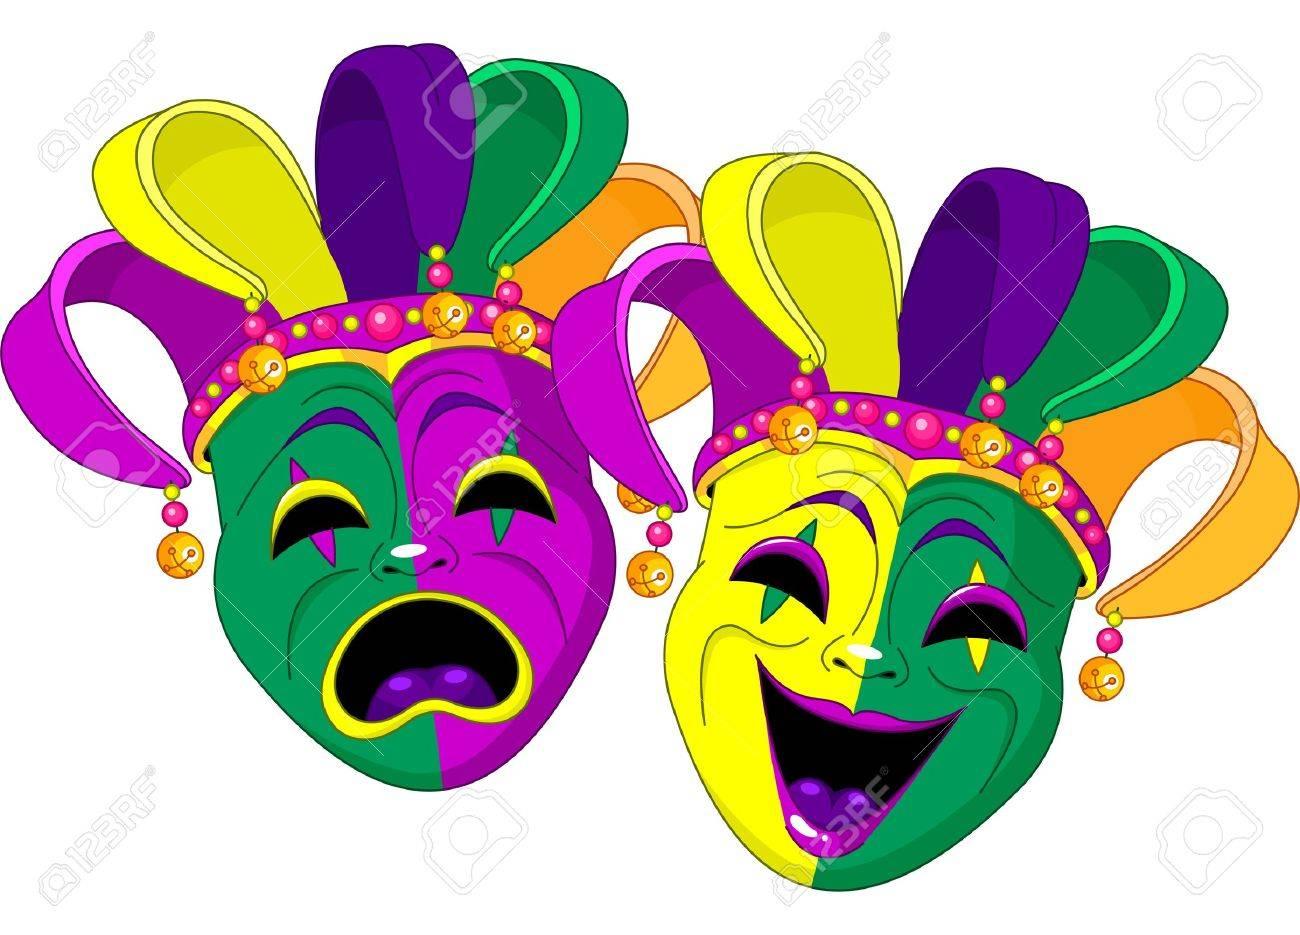 Mardi Gras Comedy and Tragedy Masks.